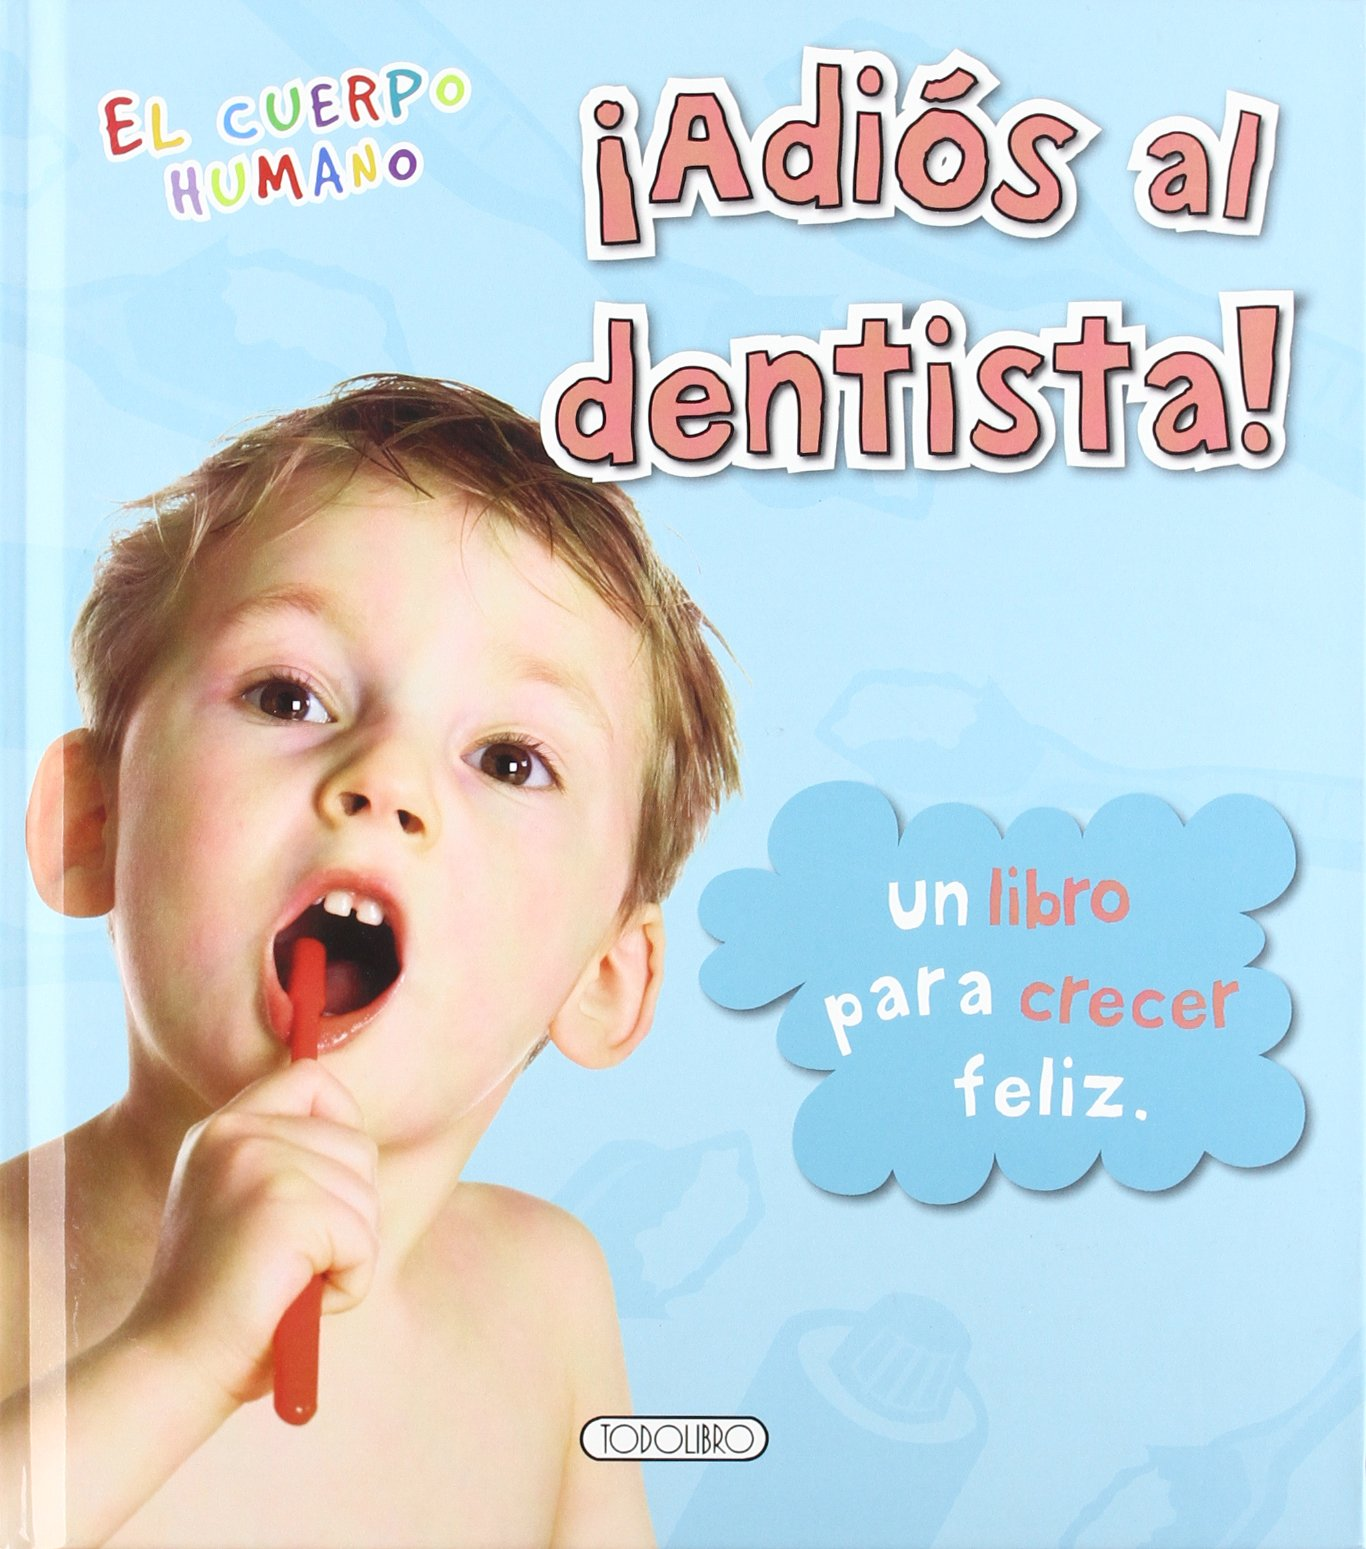 ¡Adiós al dentista! pdf